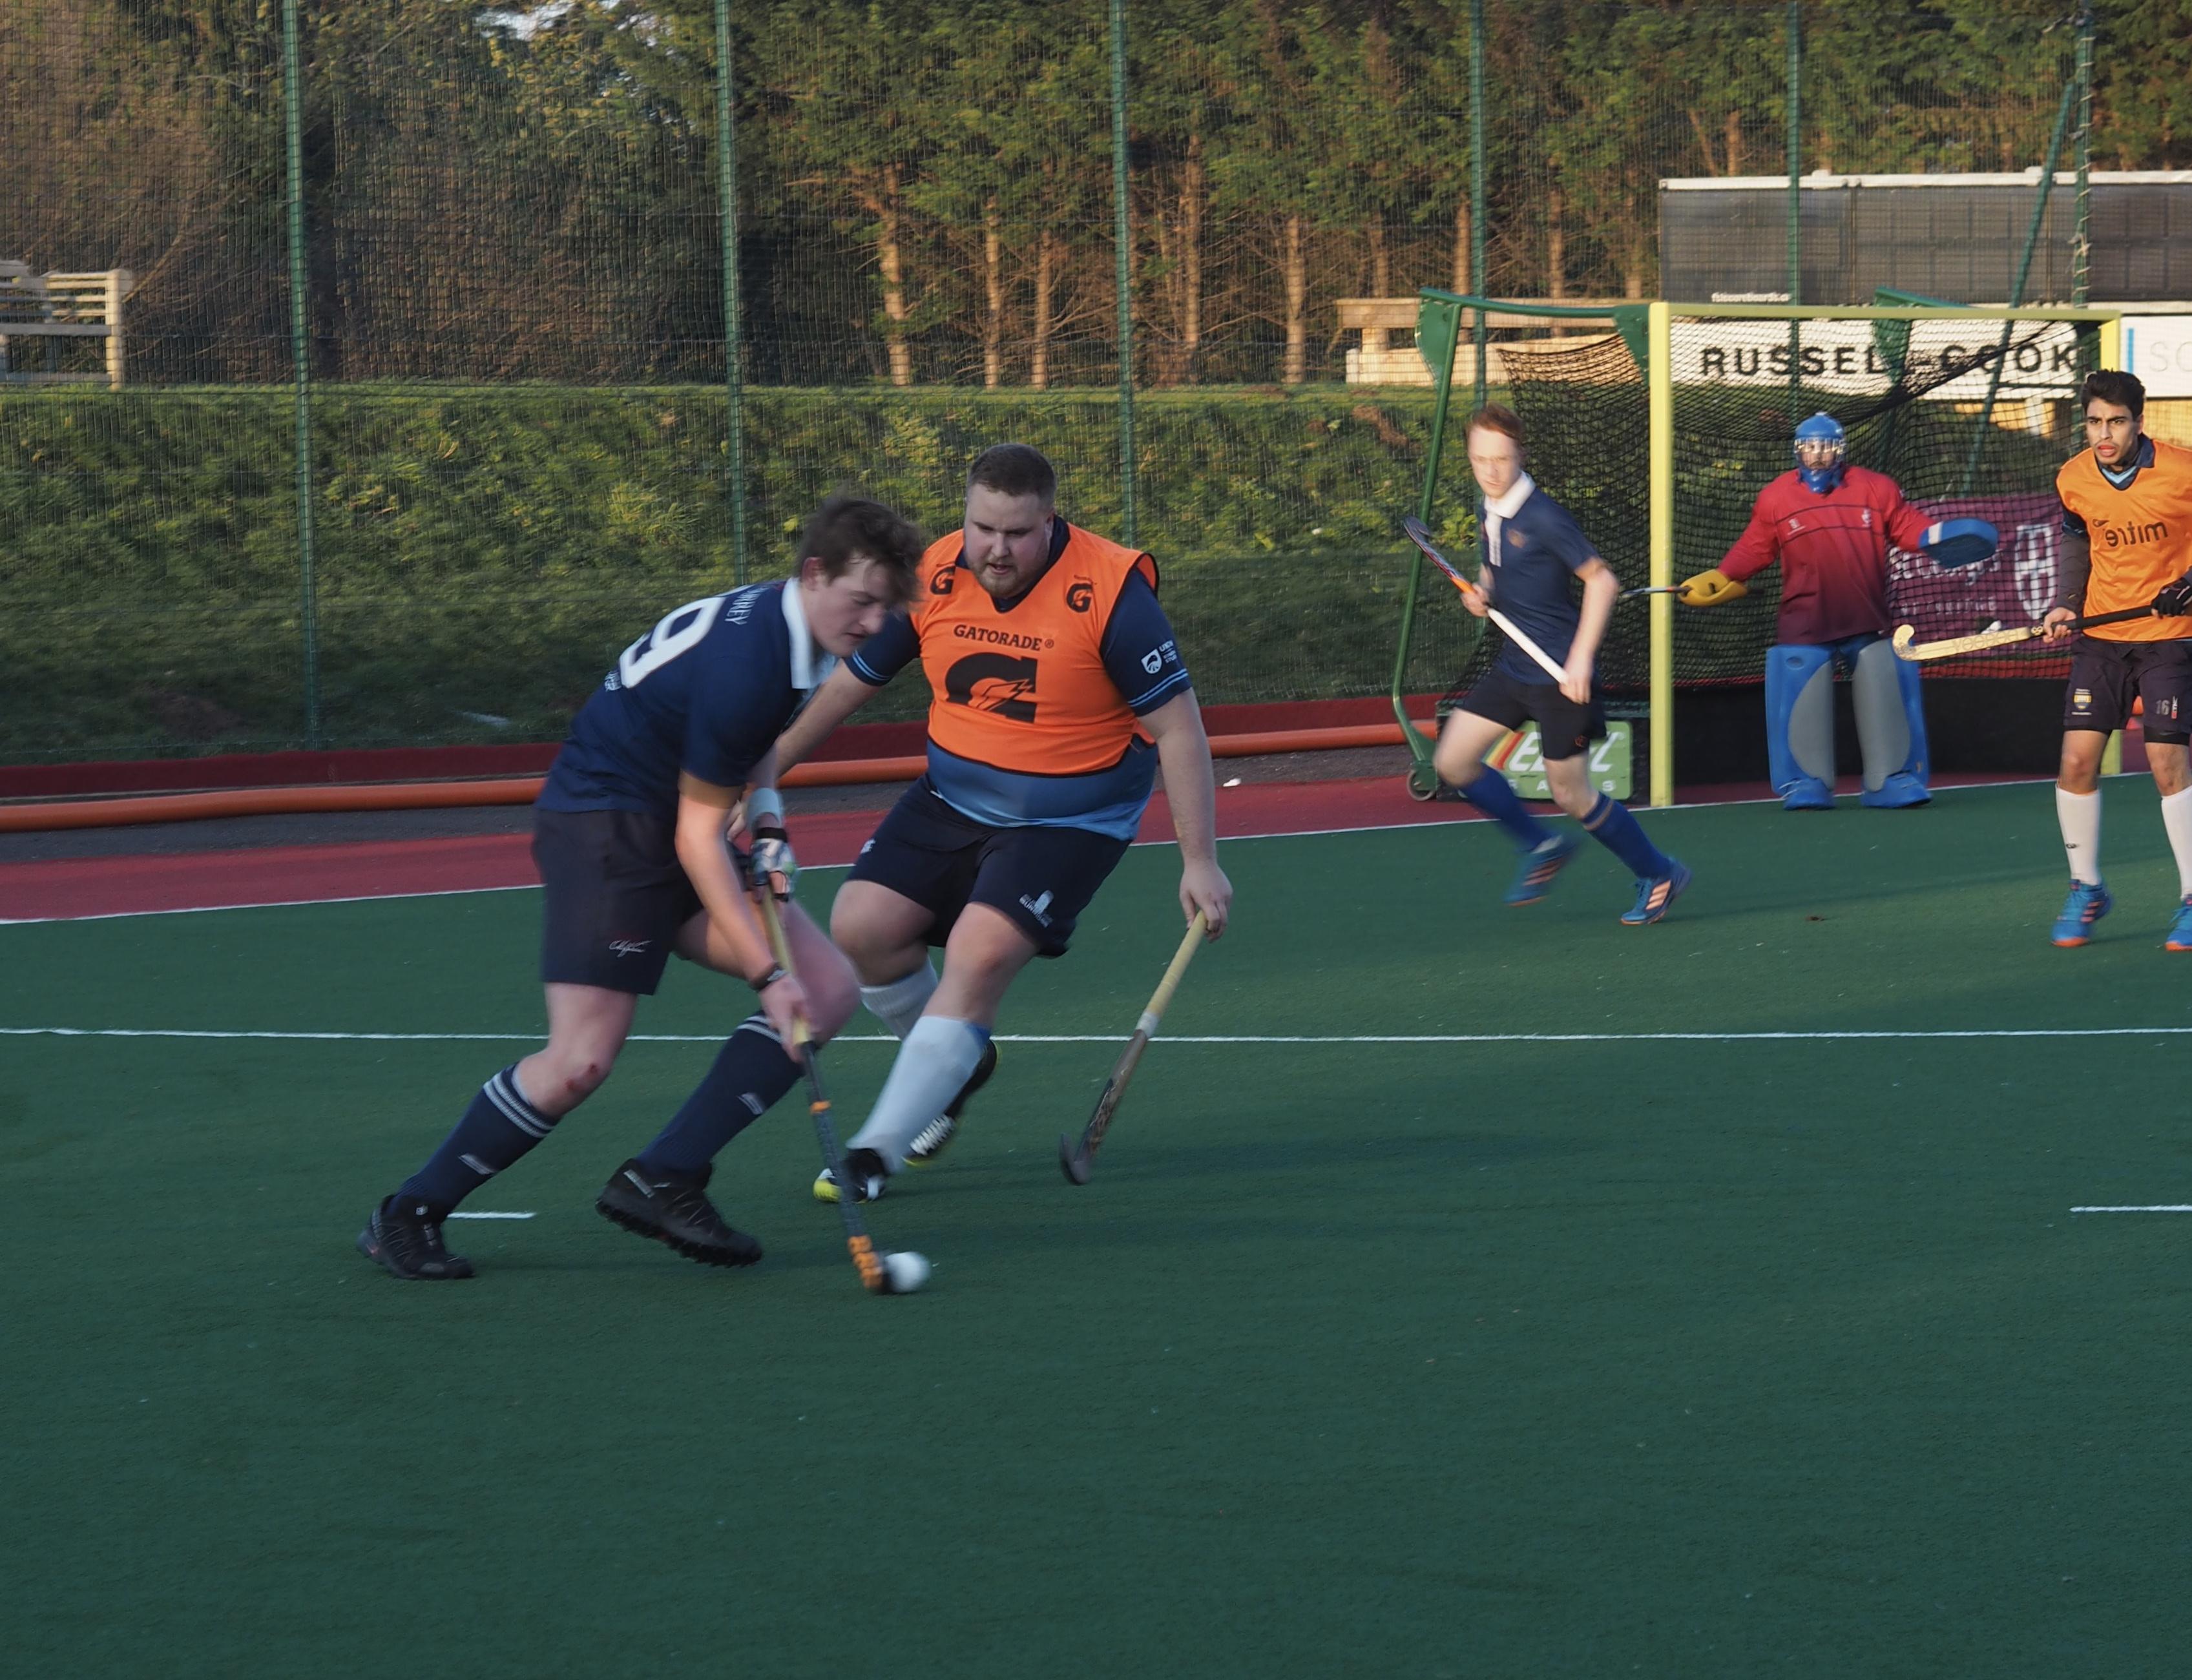 Kingston men's hockey team show massive improvement against BUCS league leader